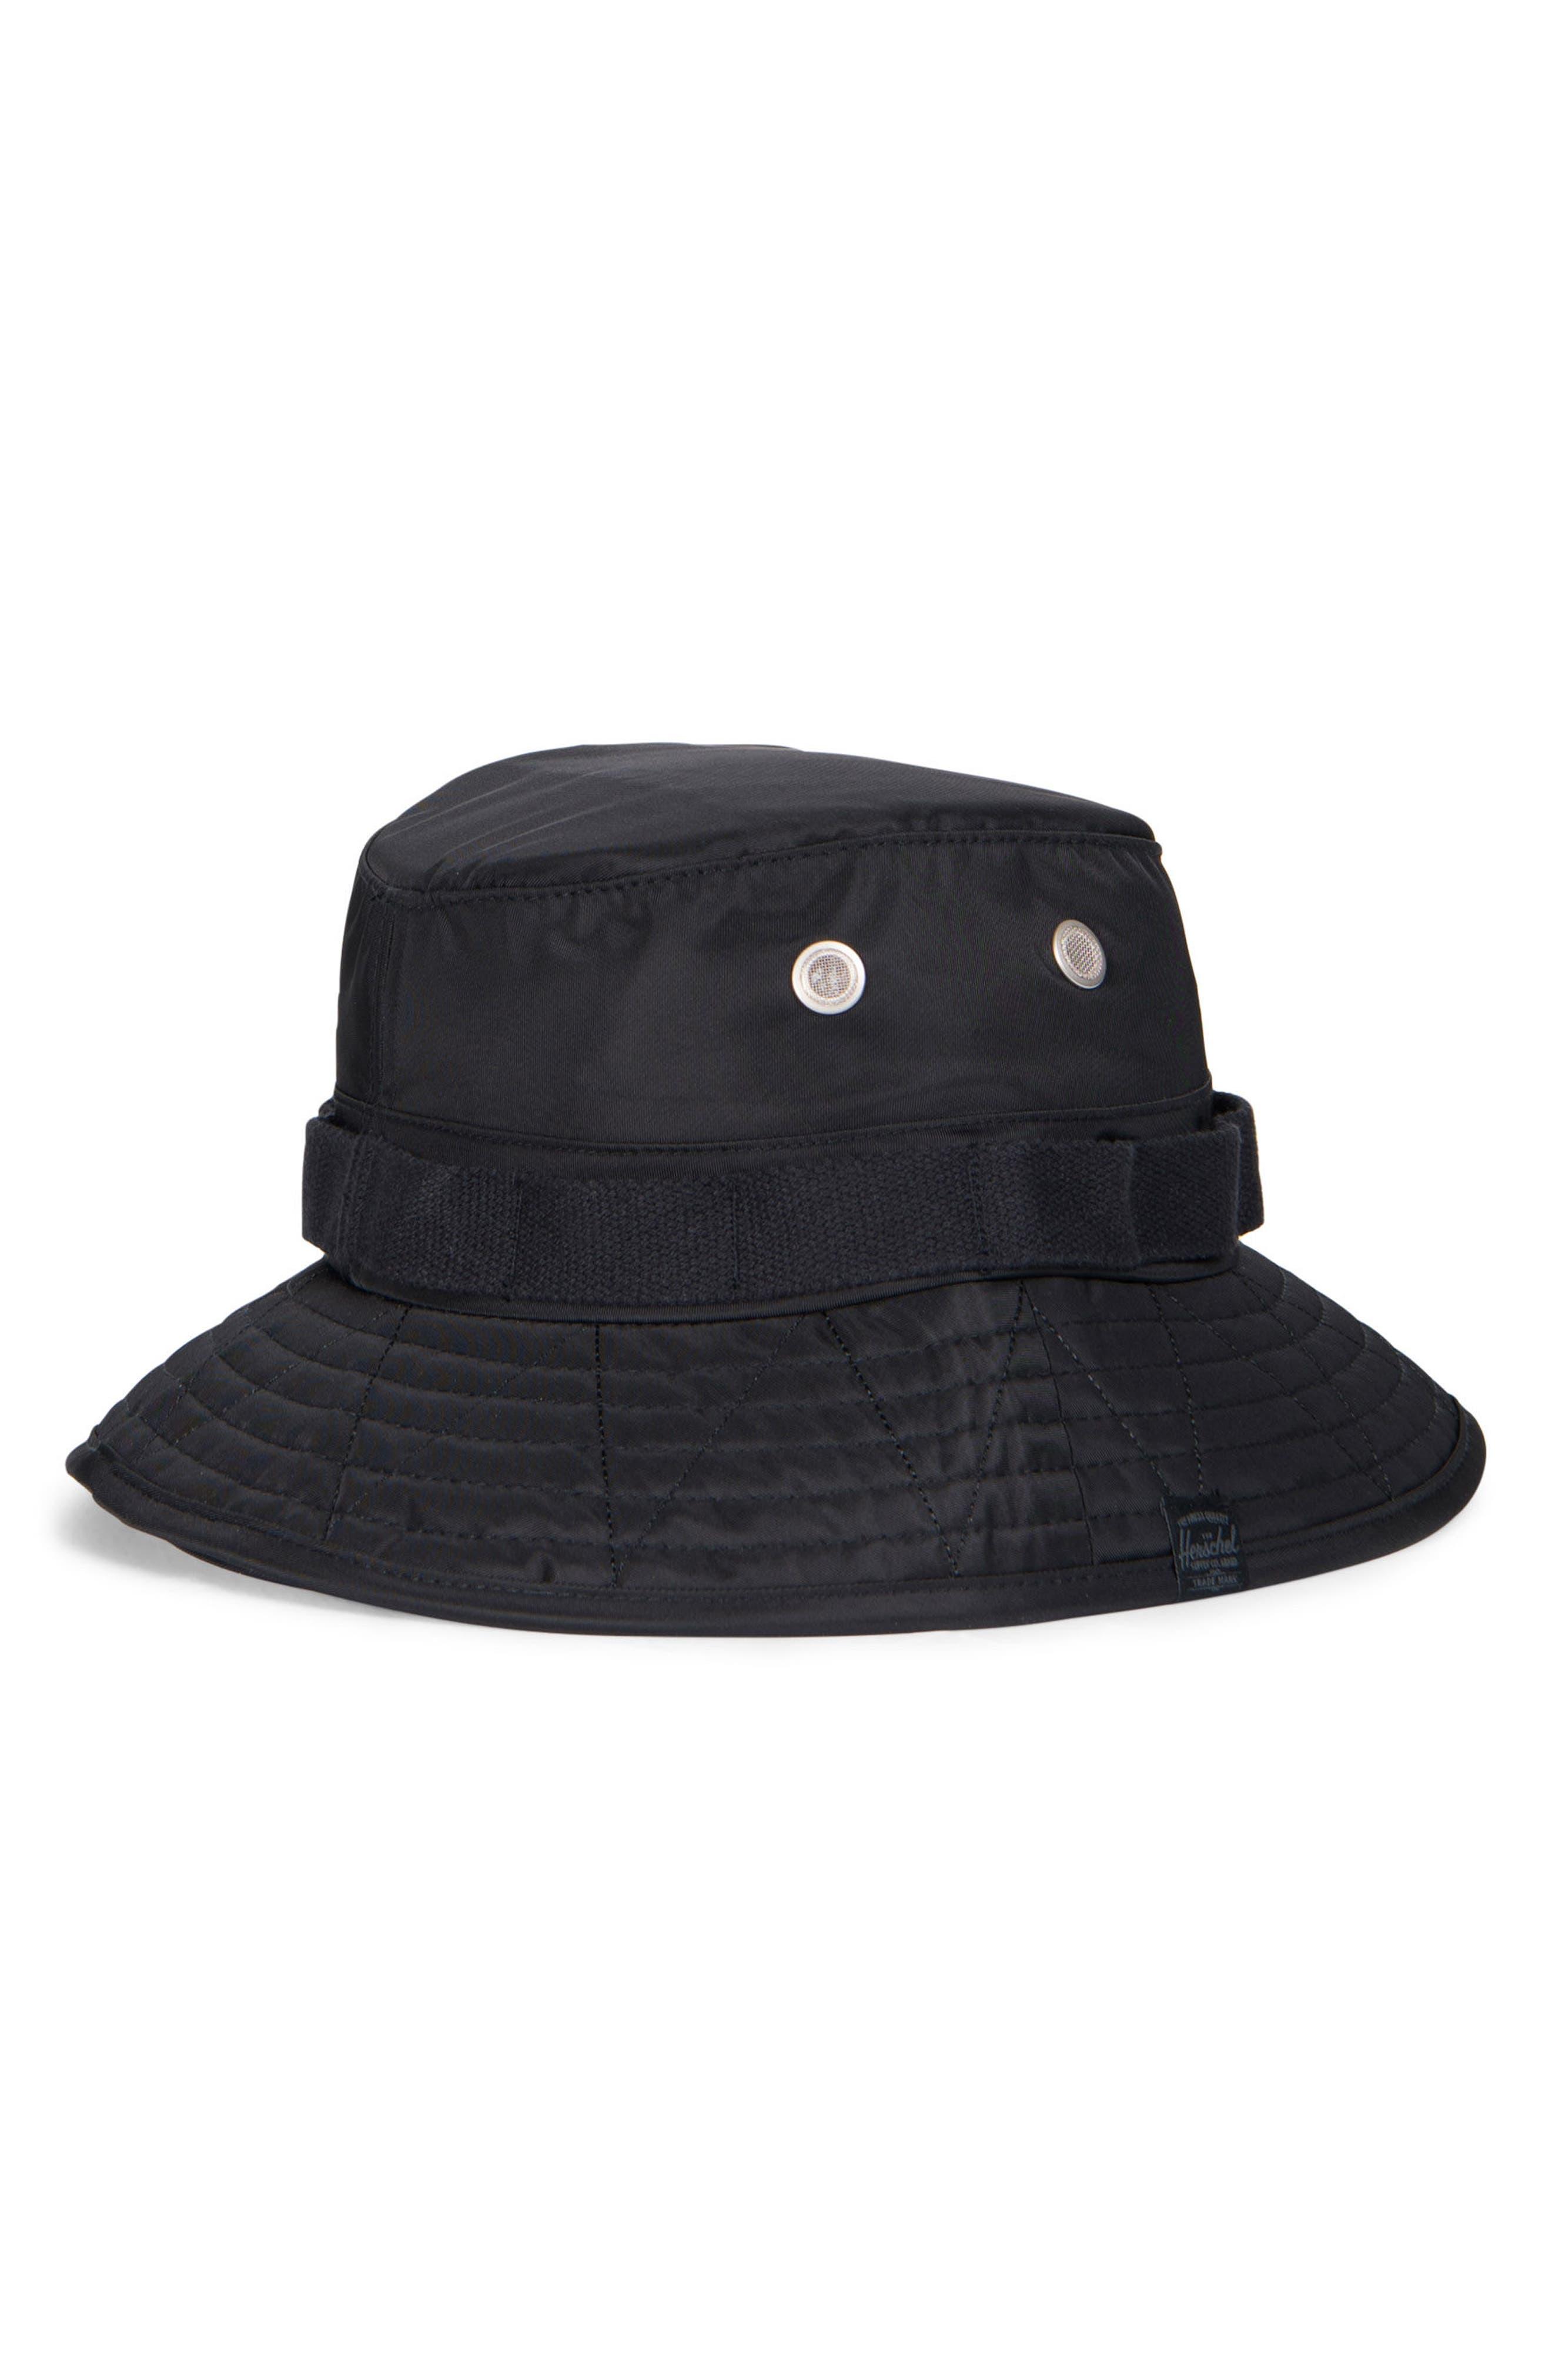 Alternate Image 2  - Herschel Supply Co. Creek Surplus Collection Bucket Hat